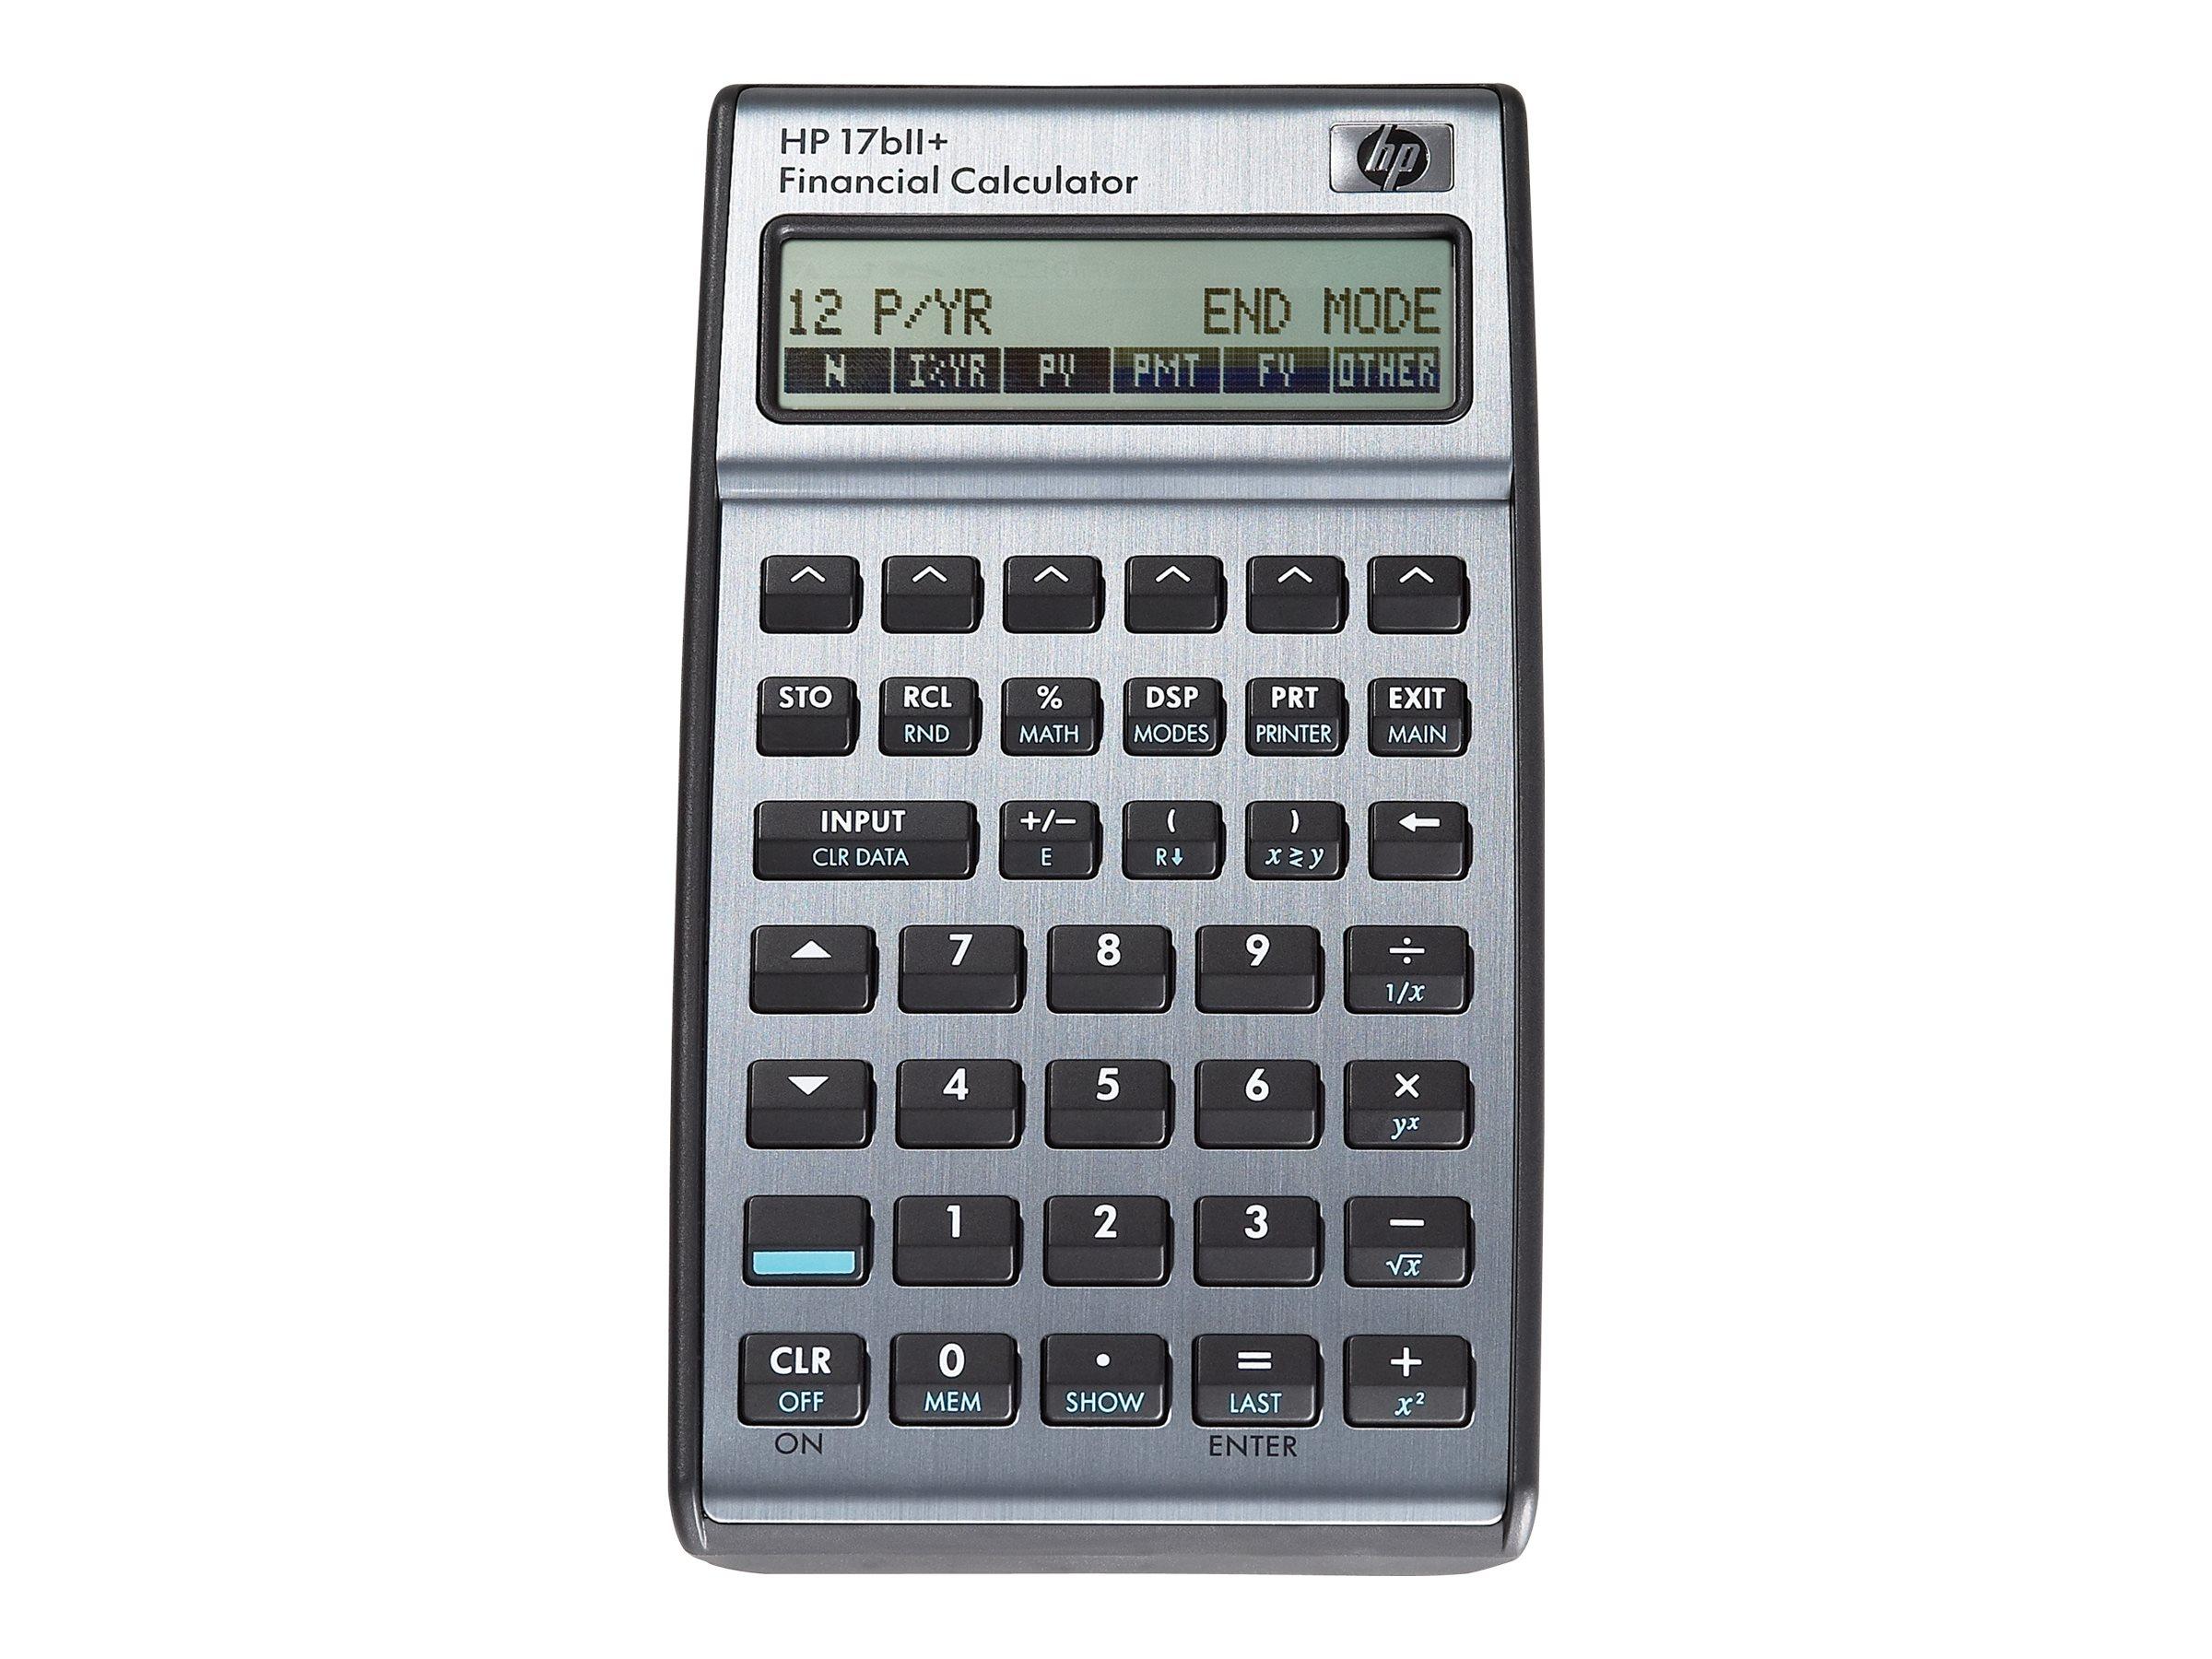 HP 17bII+ - financial calculator - F2234A#ABA | howardstore.com